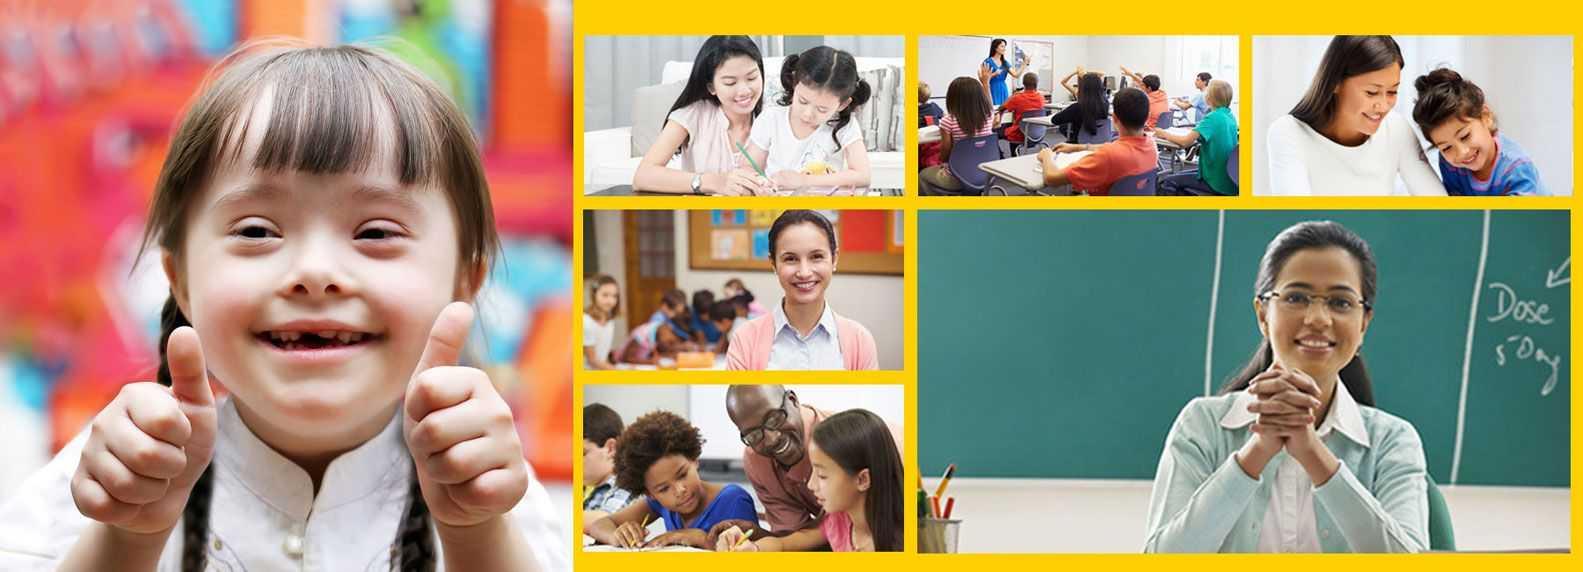 Special education needs dissertation